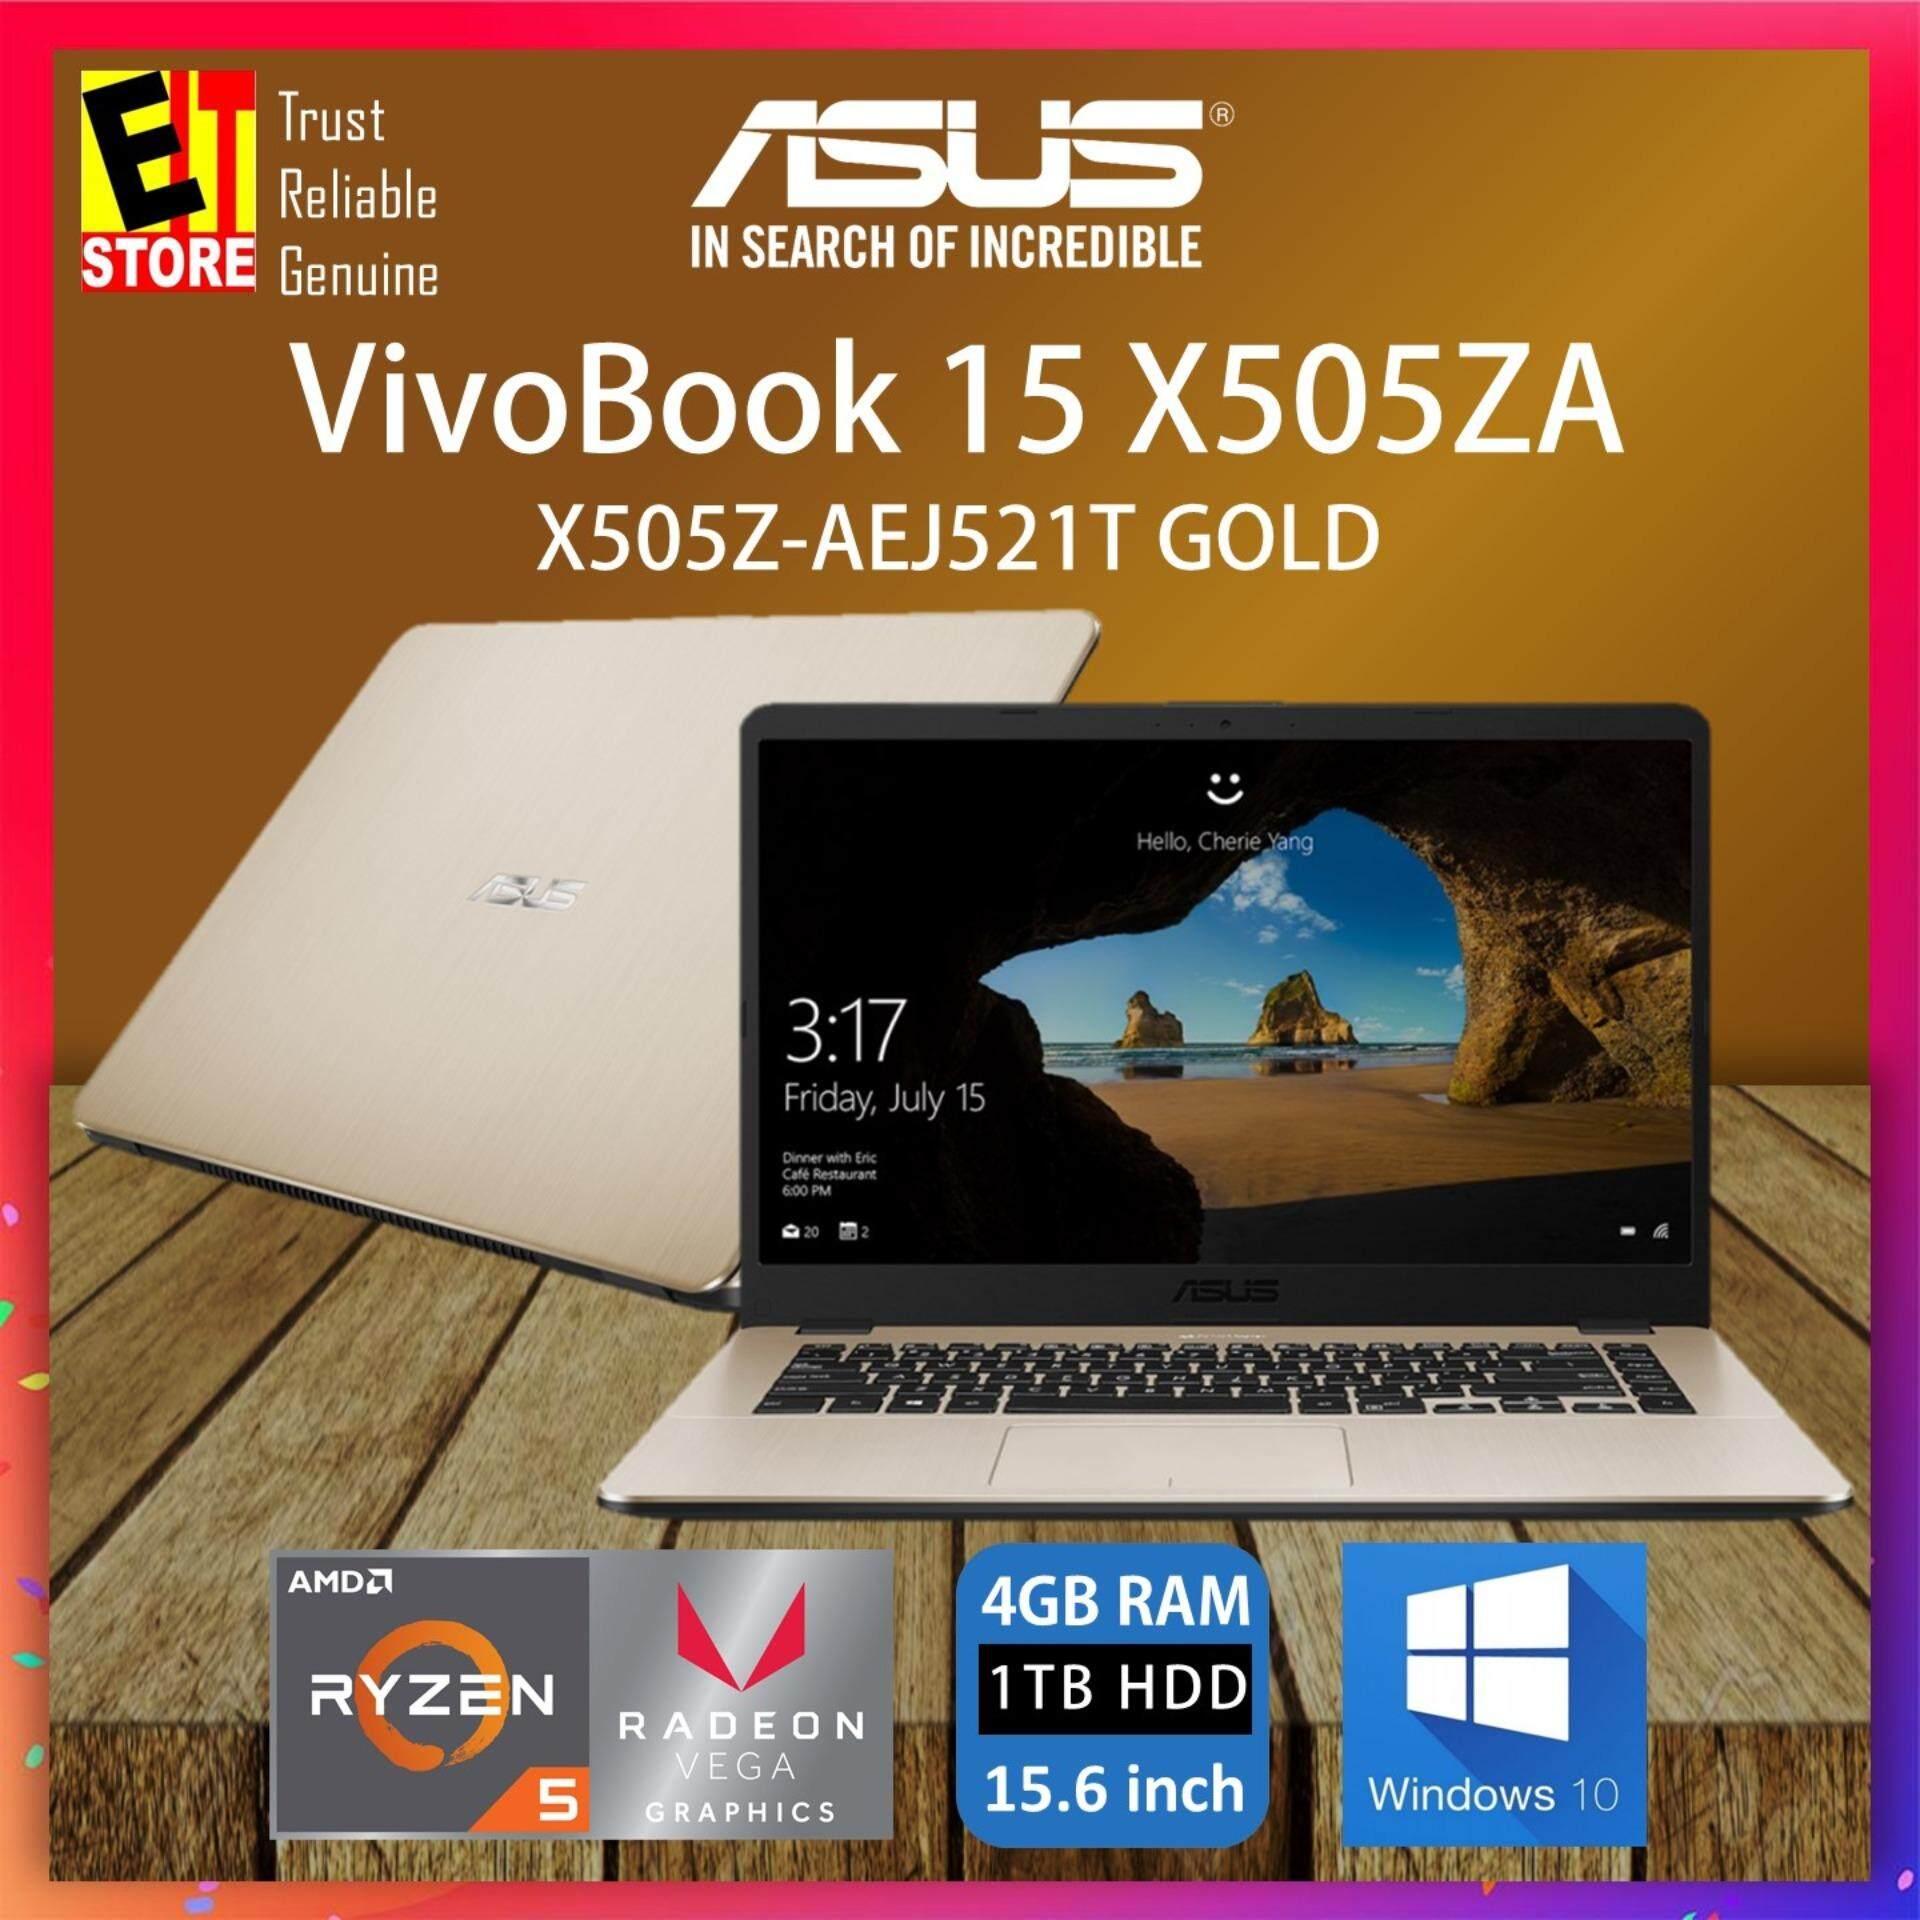 ASUS VIVOBOOK X505Z-AEJ521T GOLD (RYZEN R5-2500U/4GB/1TB/VEGA 8/15.6 FHD/W10/2YRS) + BAG Malaysia